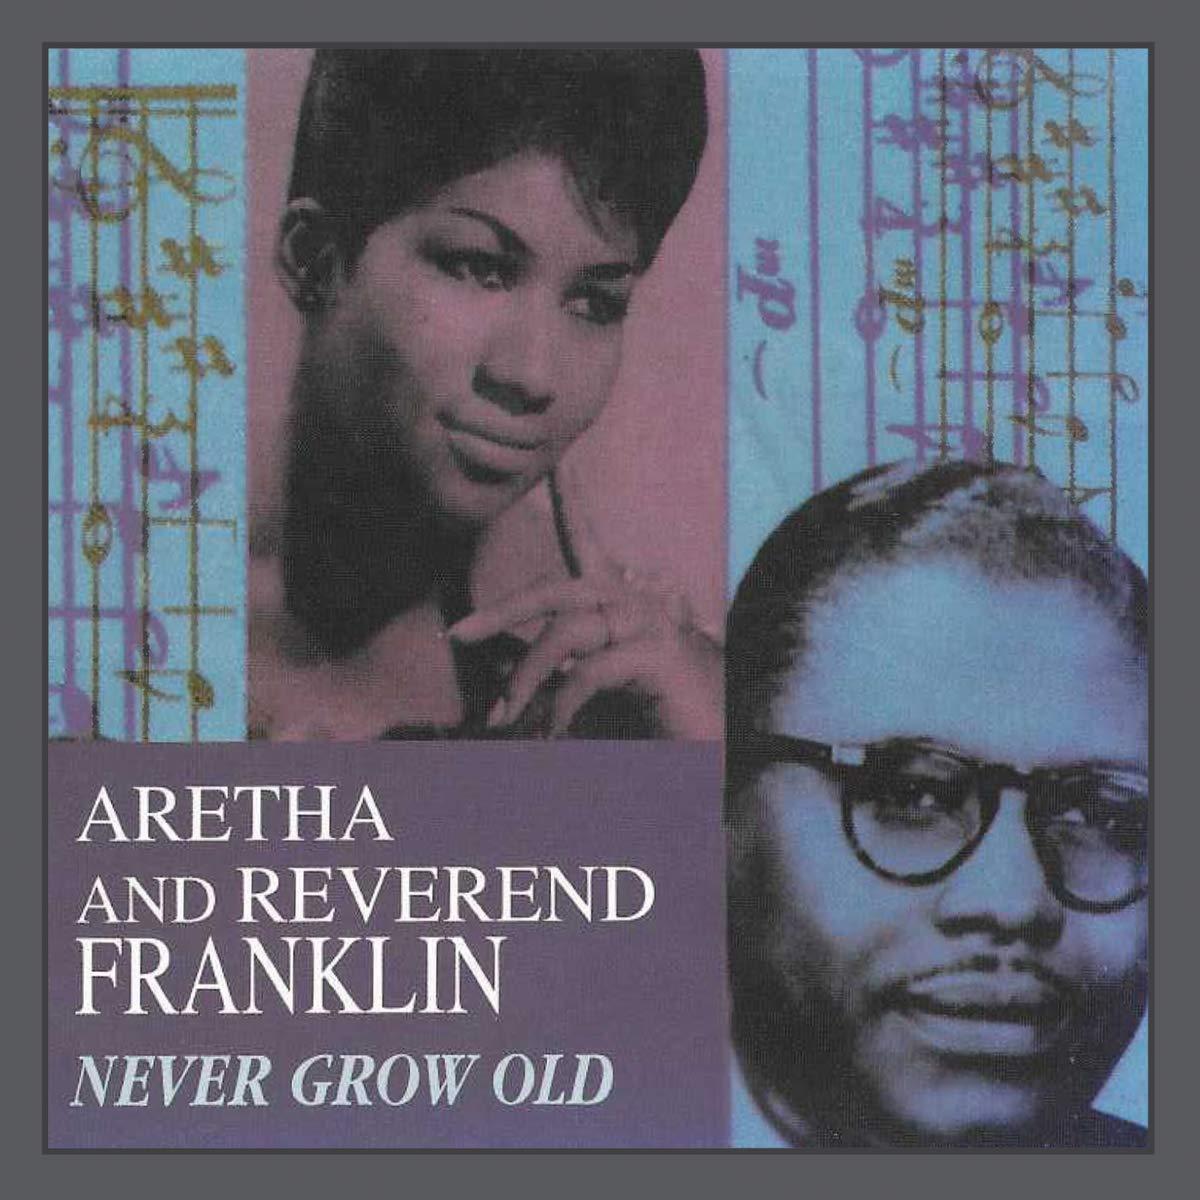 Aretha Franklin - CD & Revere Franklin - Never Grow Old